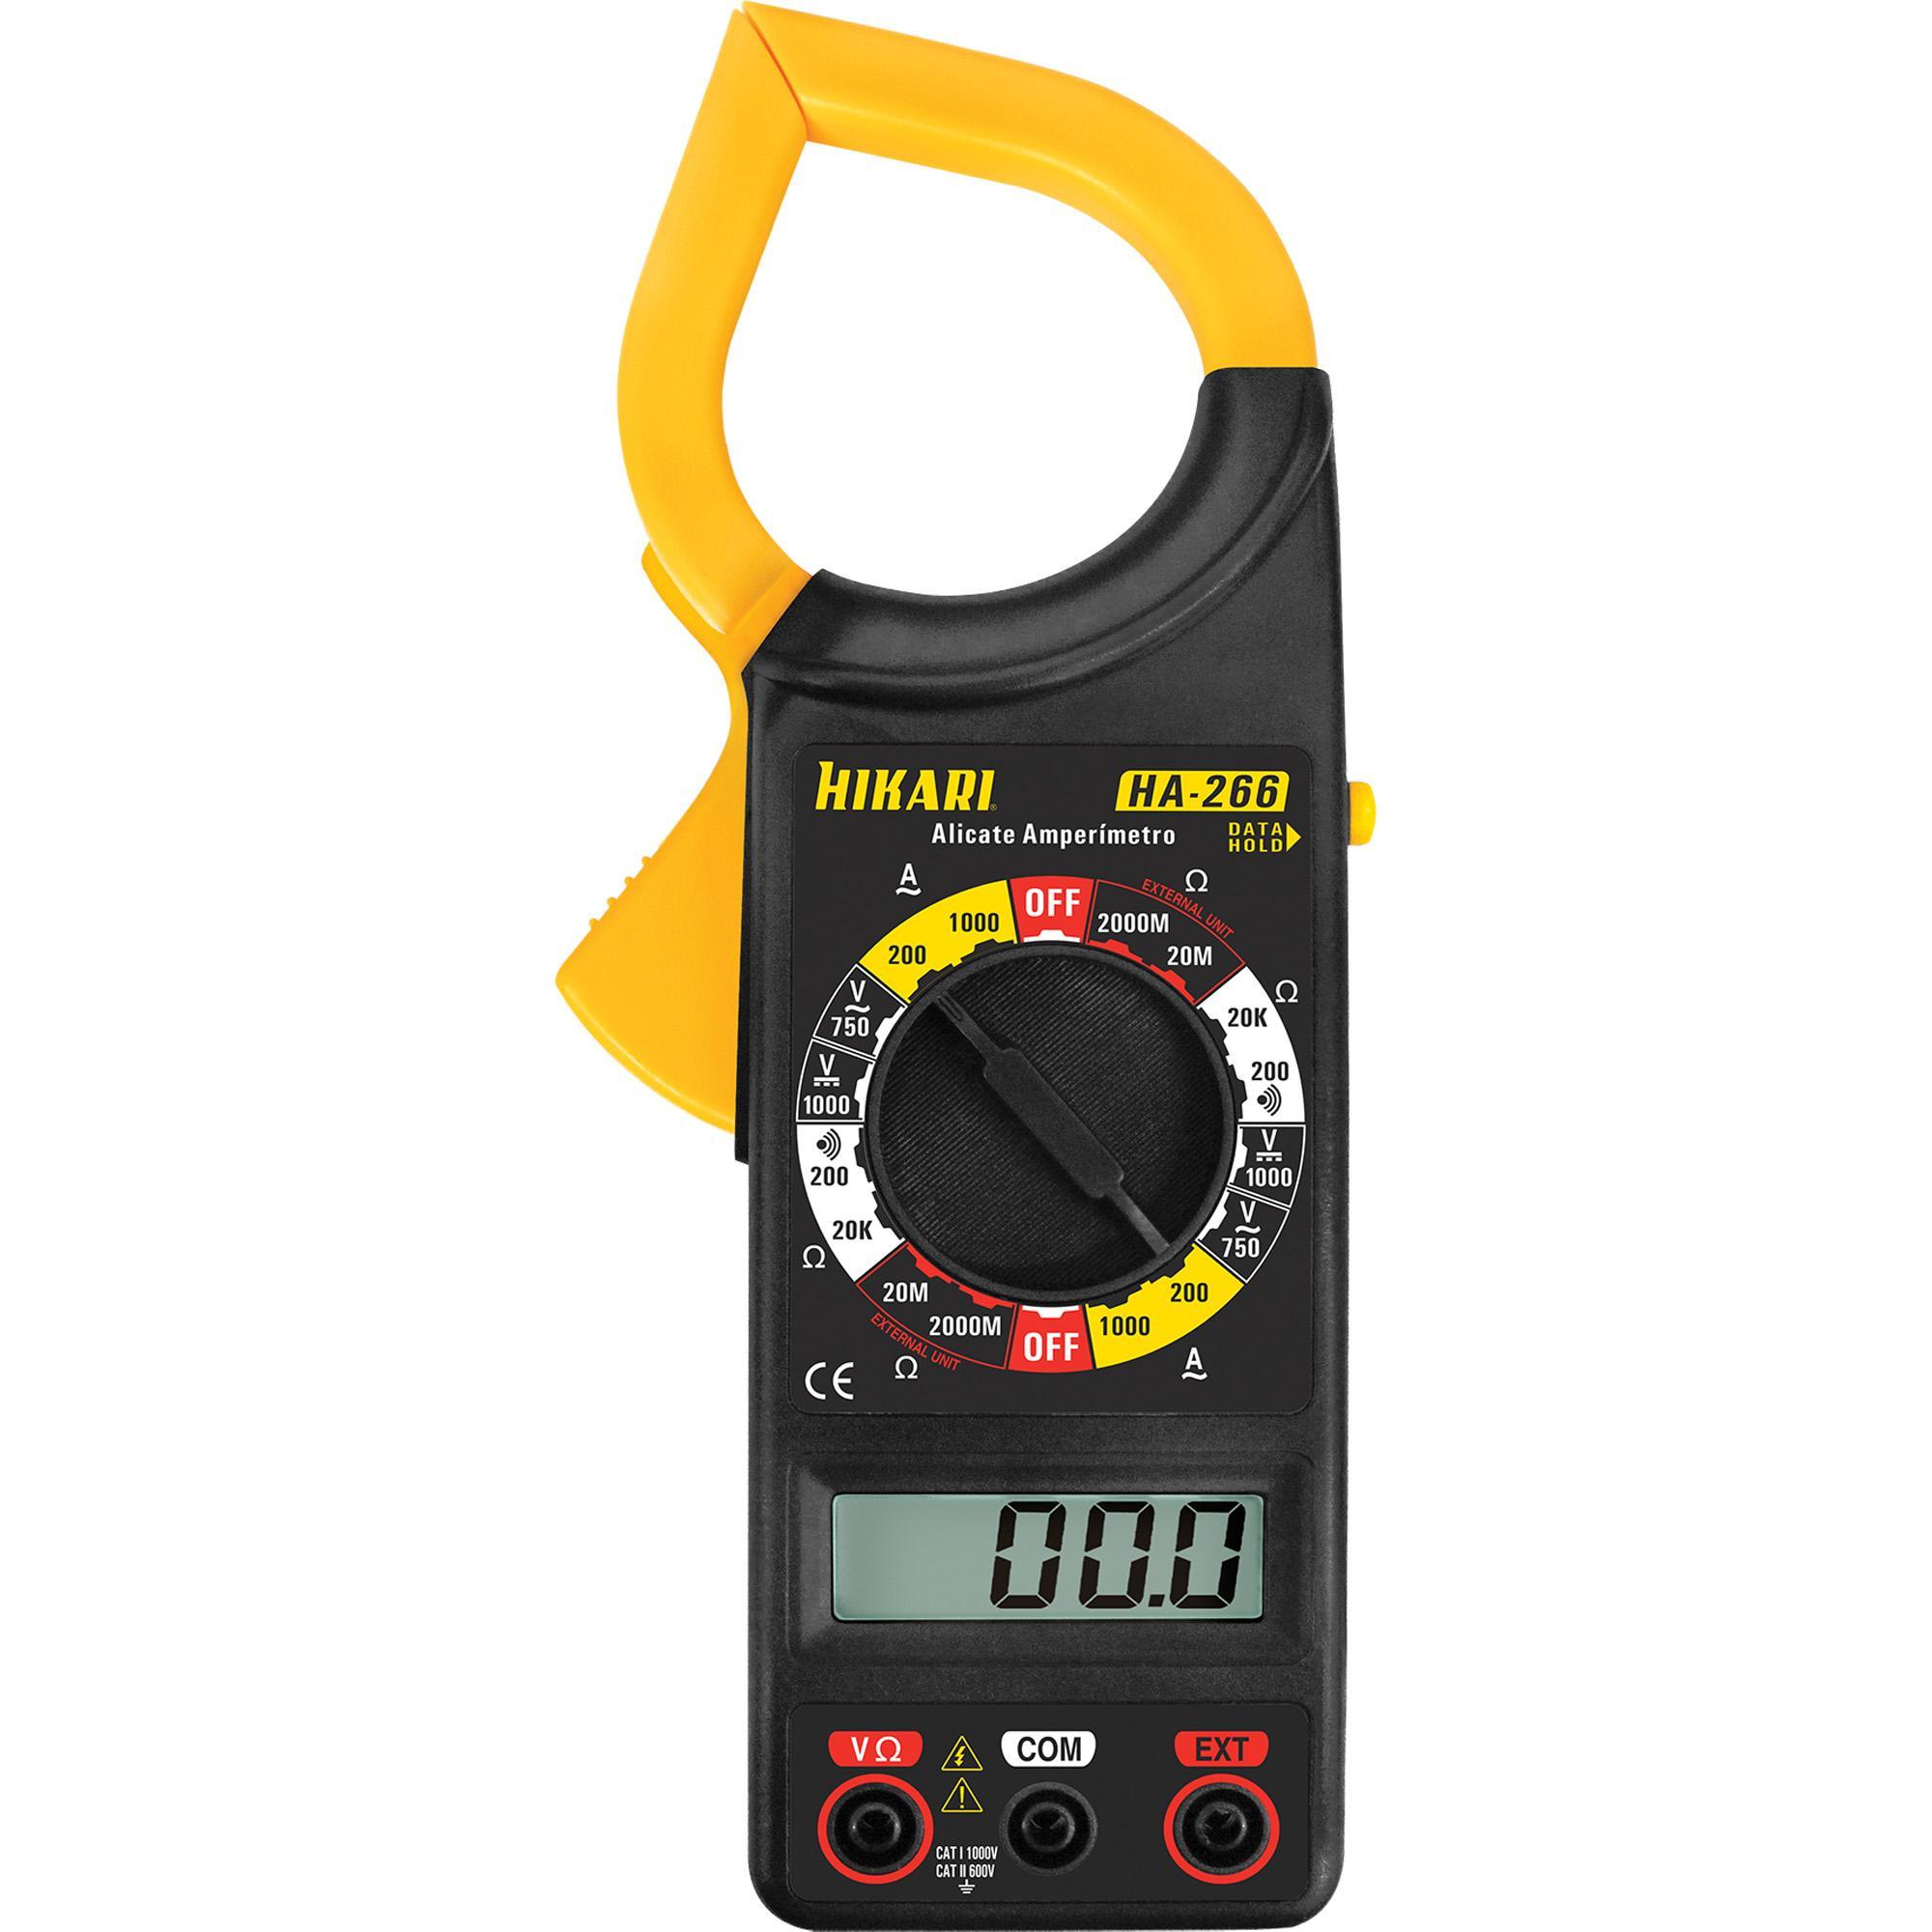 Alicate Amperímetro HA266 HIKARI